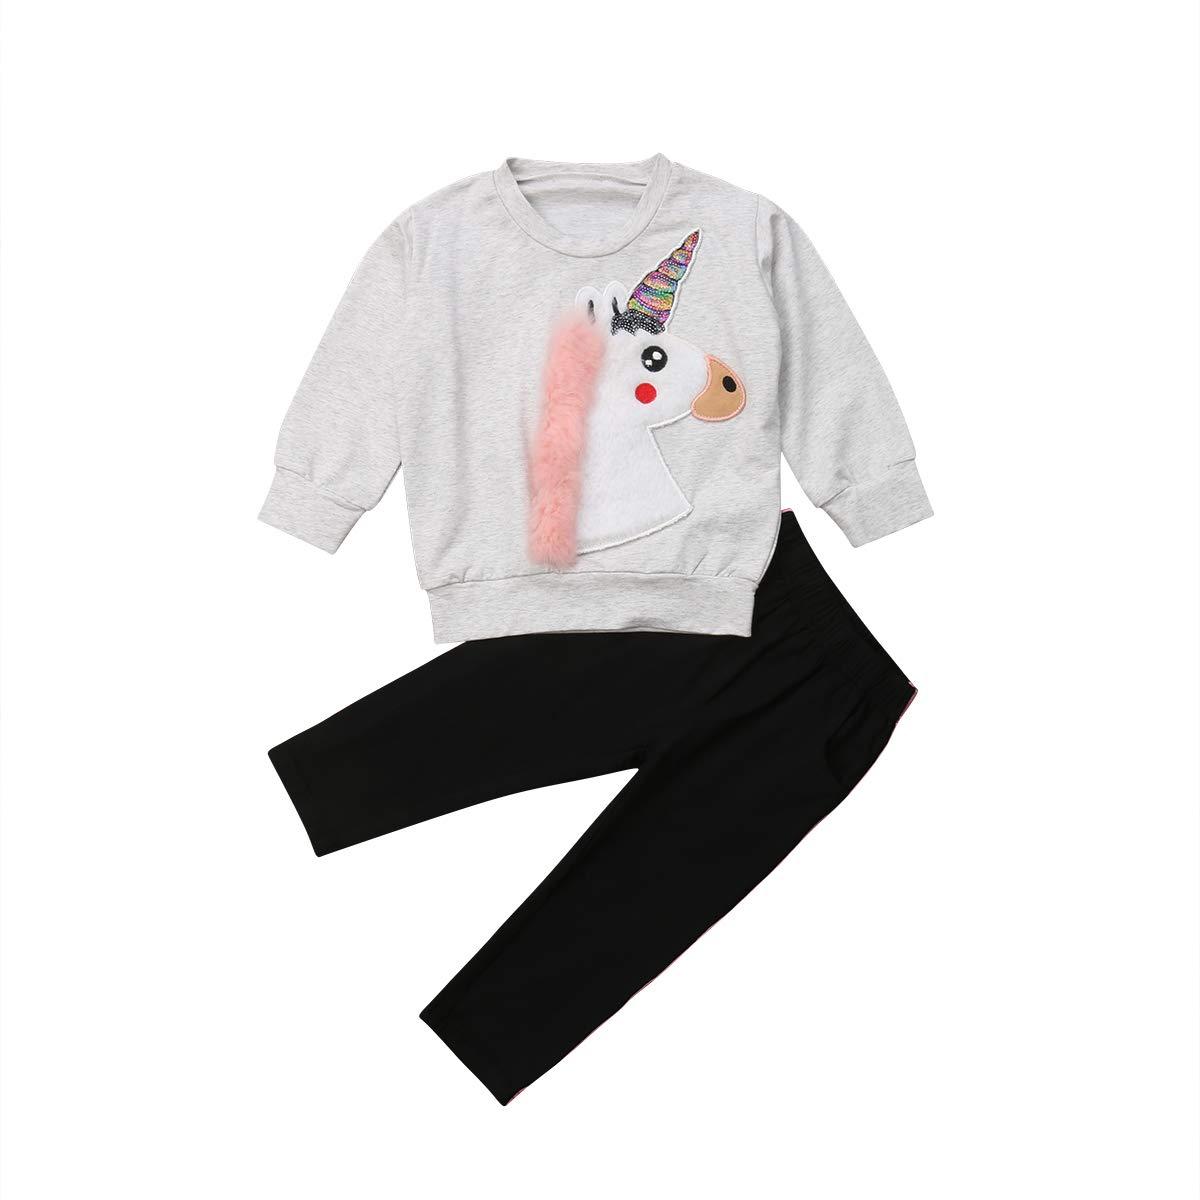 ITFABS Baby Girl Unicorn Outfits Set Cute Unicorn Hoodies Sweatshirts Stripes Pants